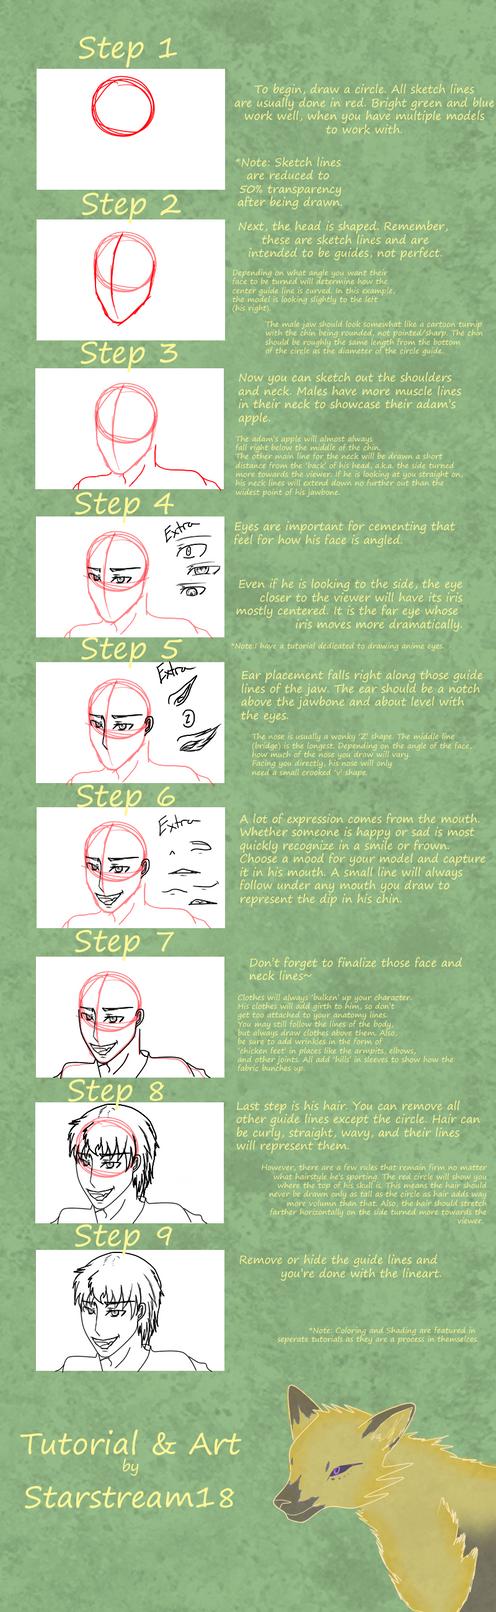 How to Draw - MALE ANIME HEADSHOTS (Tutorial) by Starstream18